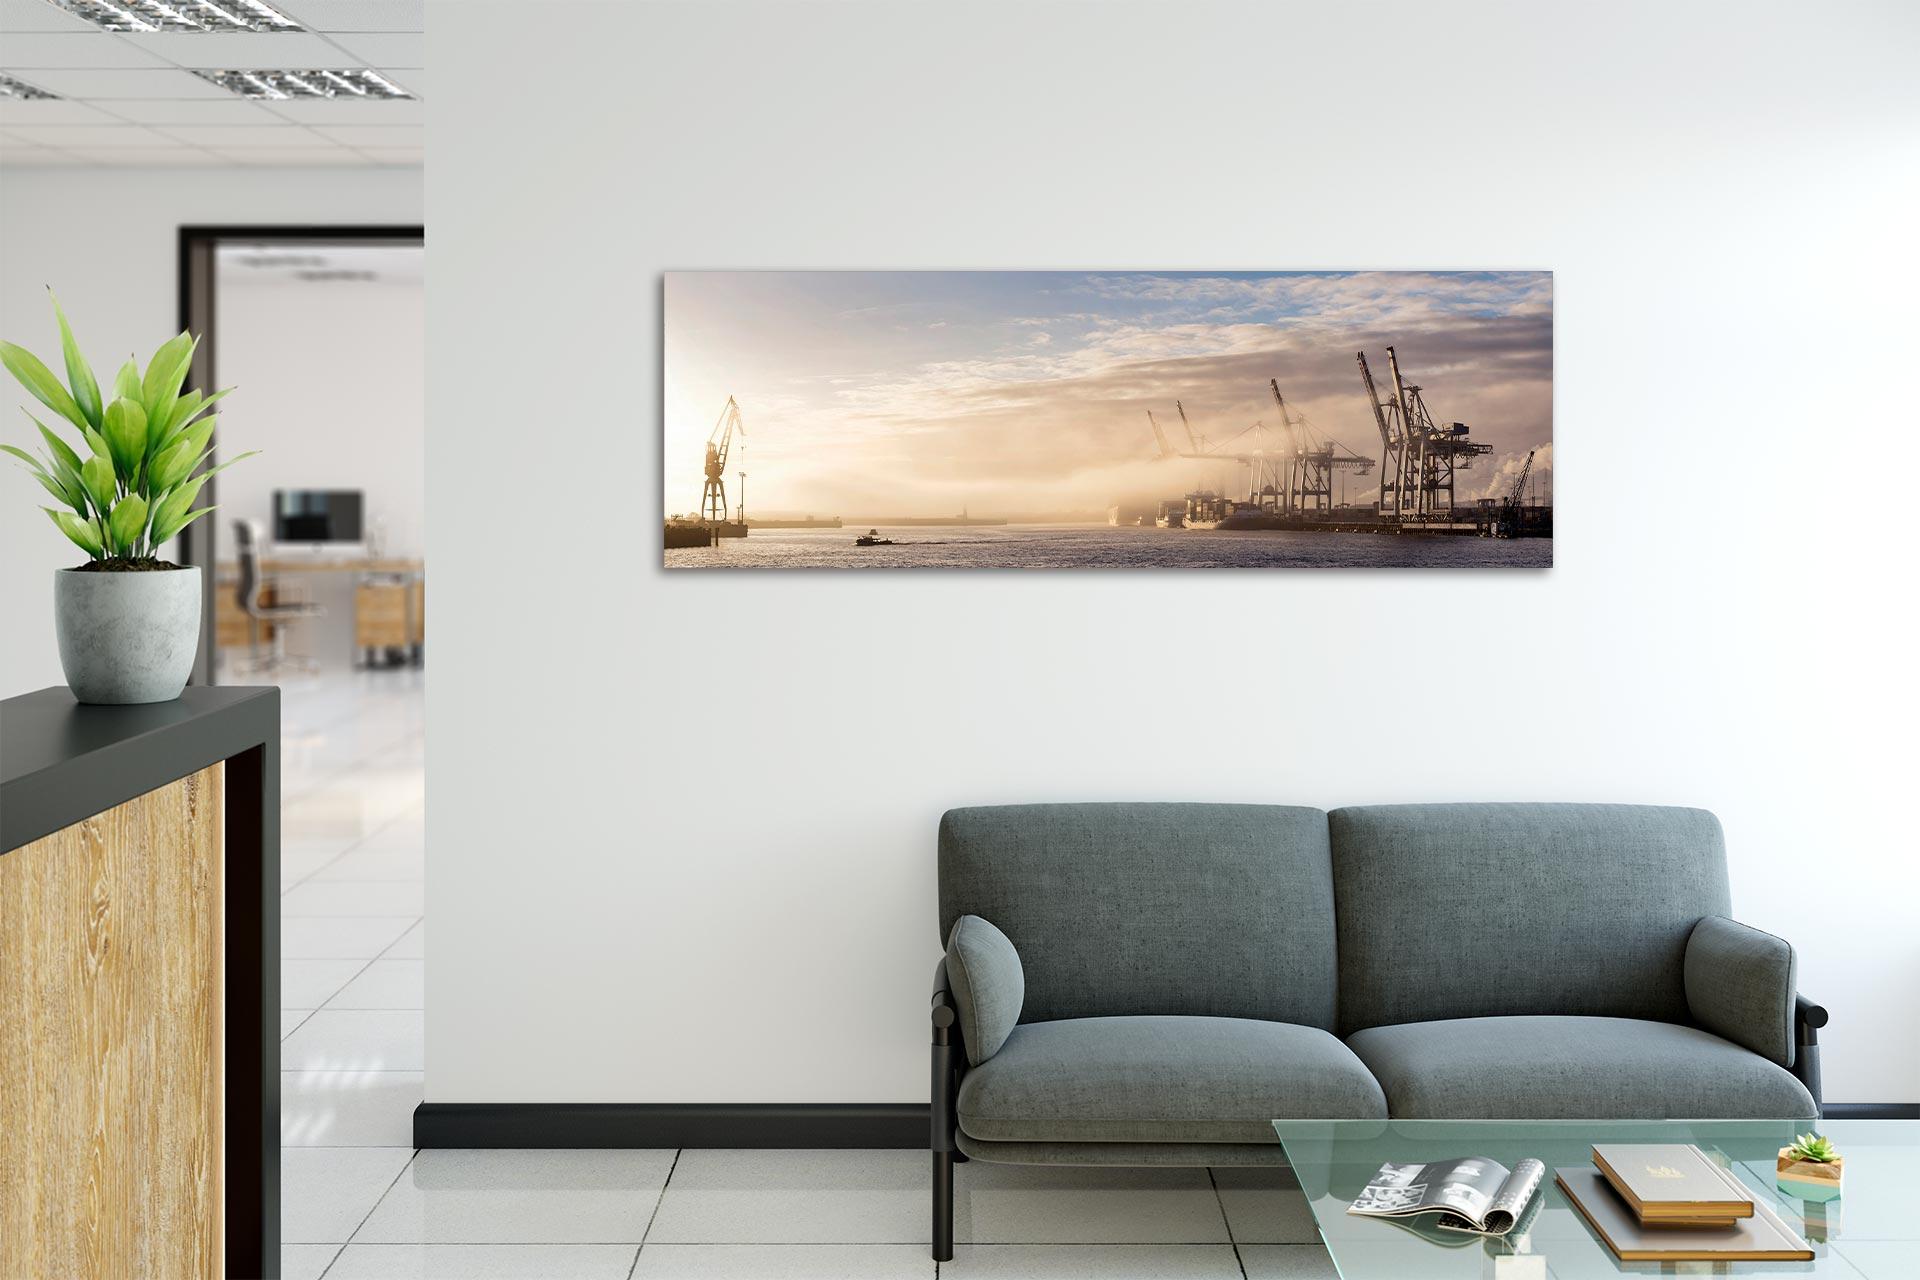 PSW101-panorama-hafen-leinwand-acrylglas-aludibond-empfang